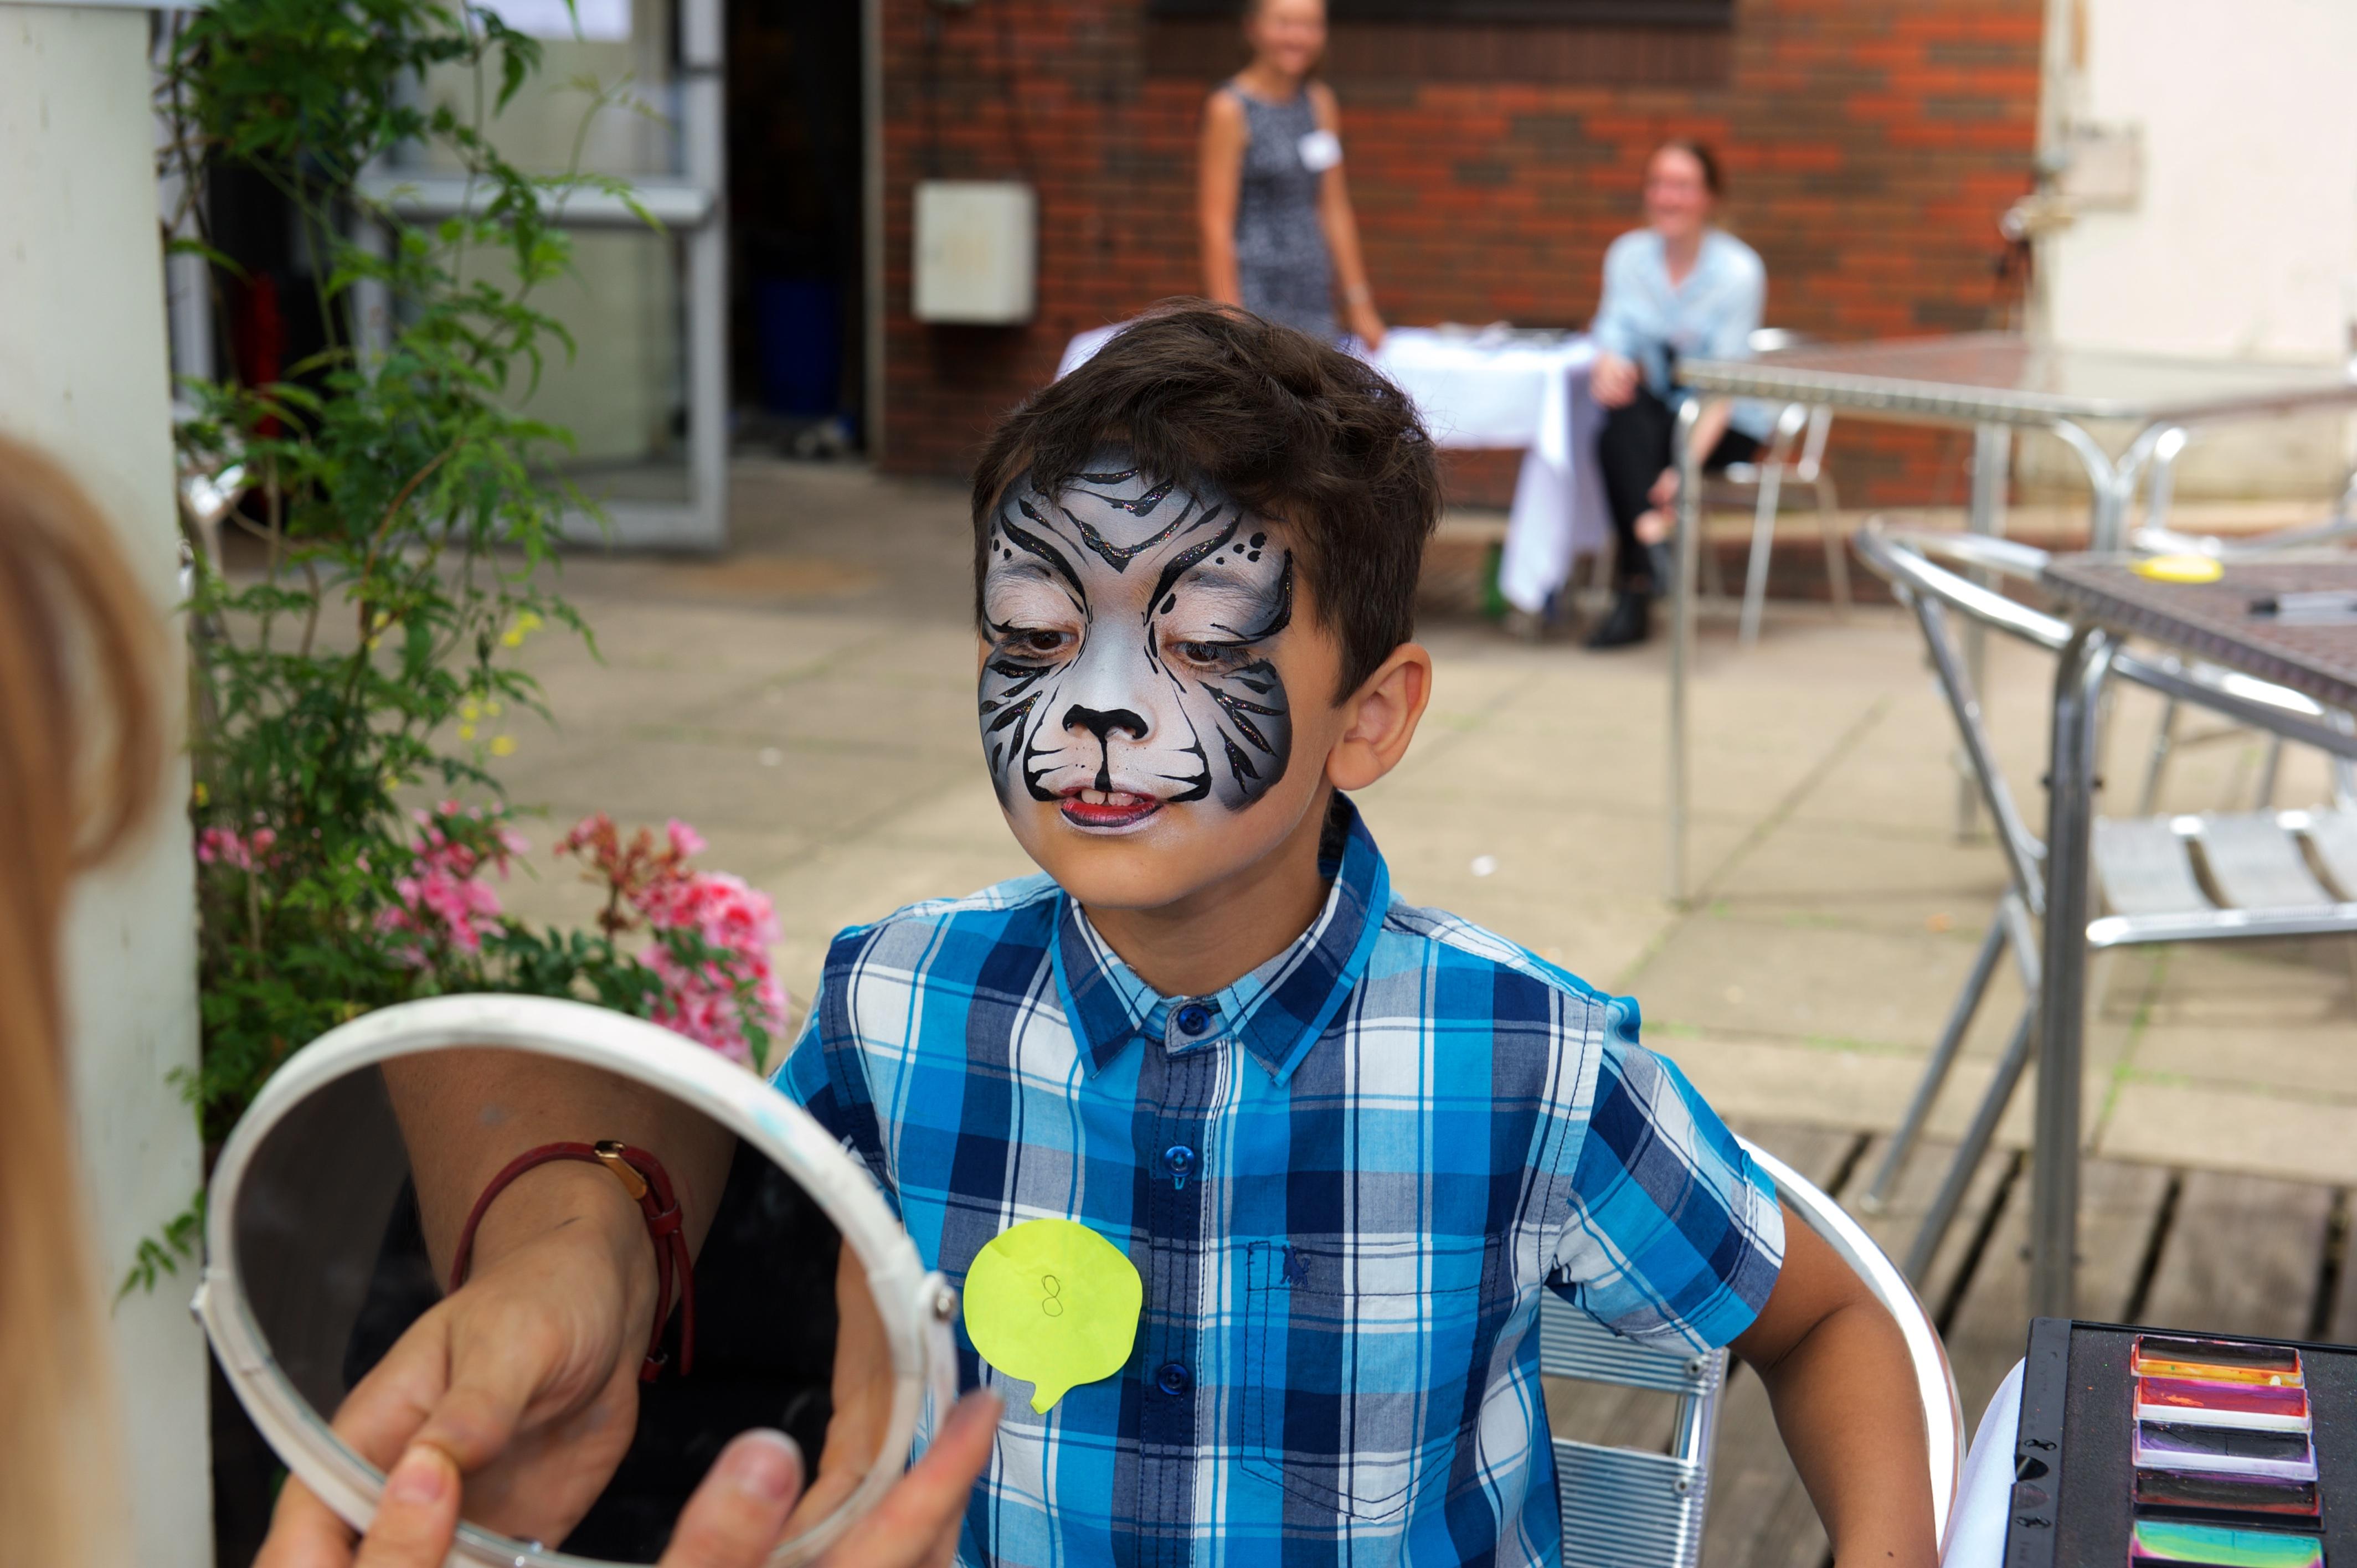 Snow tiger face paint